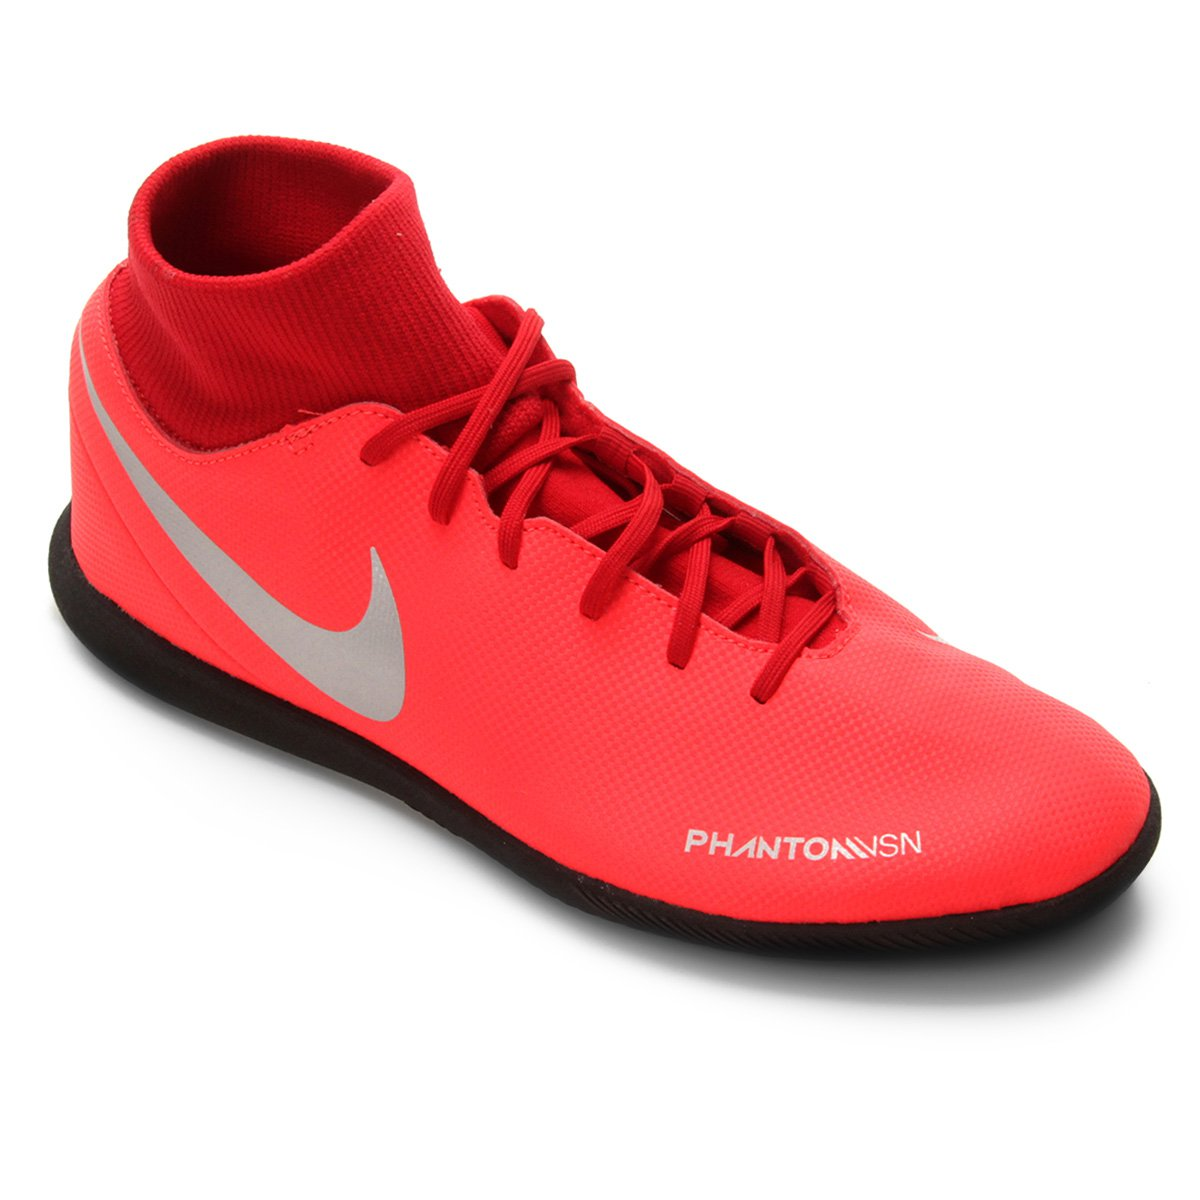 92131a093e Chuteira Futsal Nike Phantom Vision Club DF IC - Vermelho e Prata ...